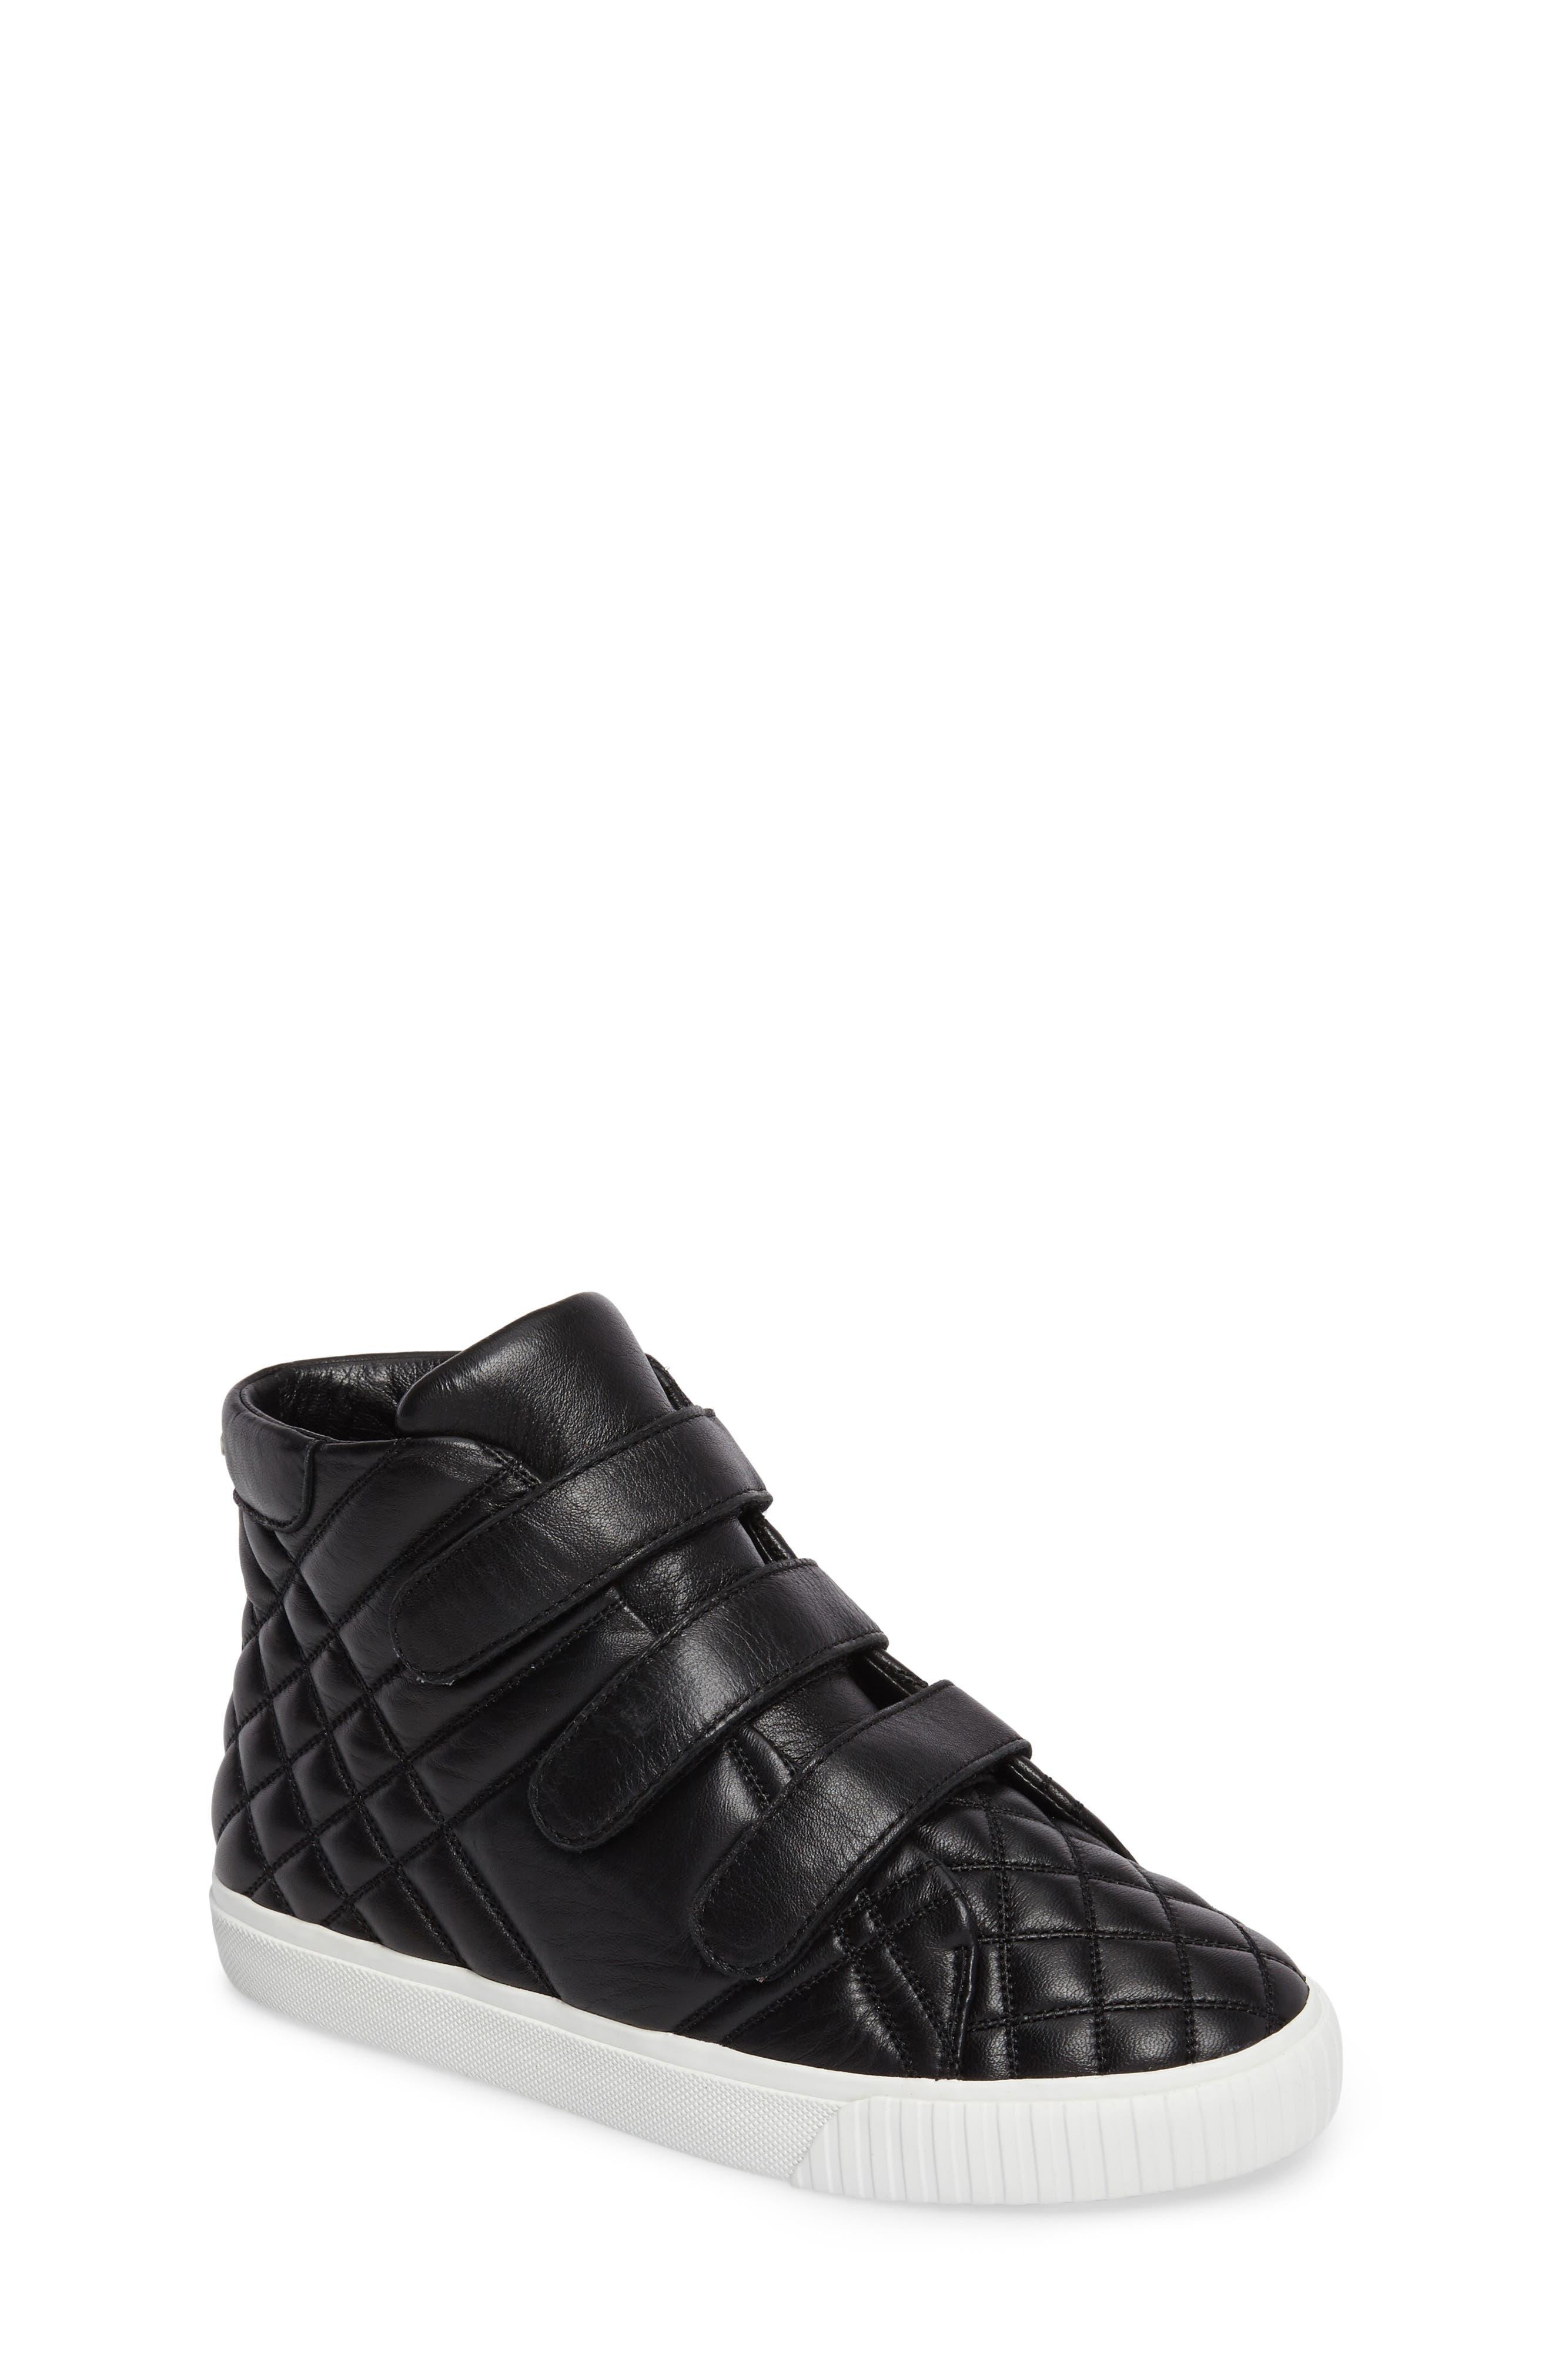 Alternate Image 1 Selected - Burberry Sturrock Quilted High Top Sneaker (Walker, Toddler, Little Kid & Big Kid)